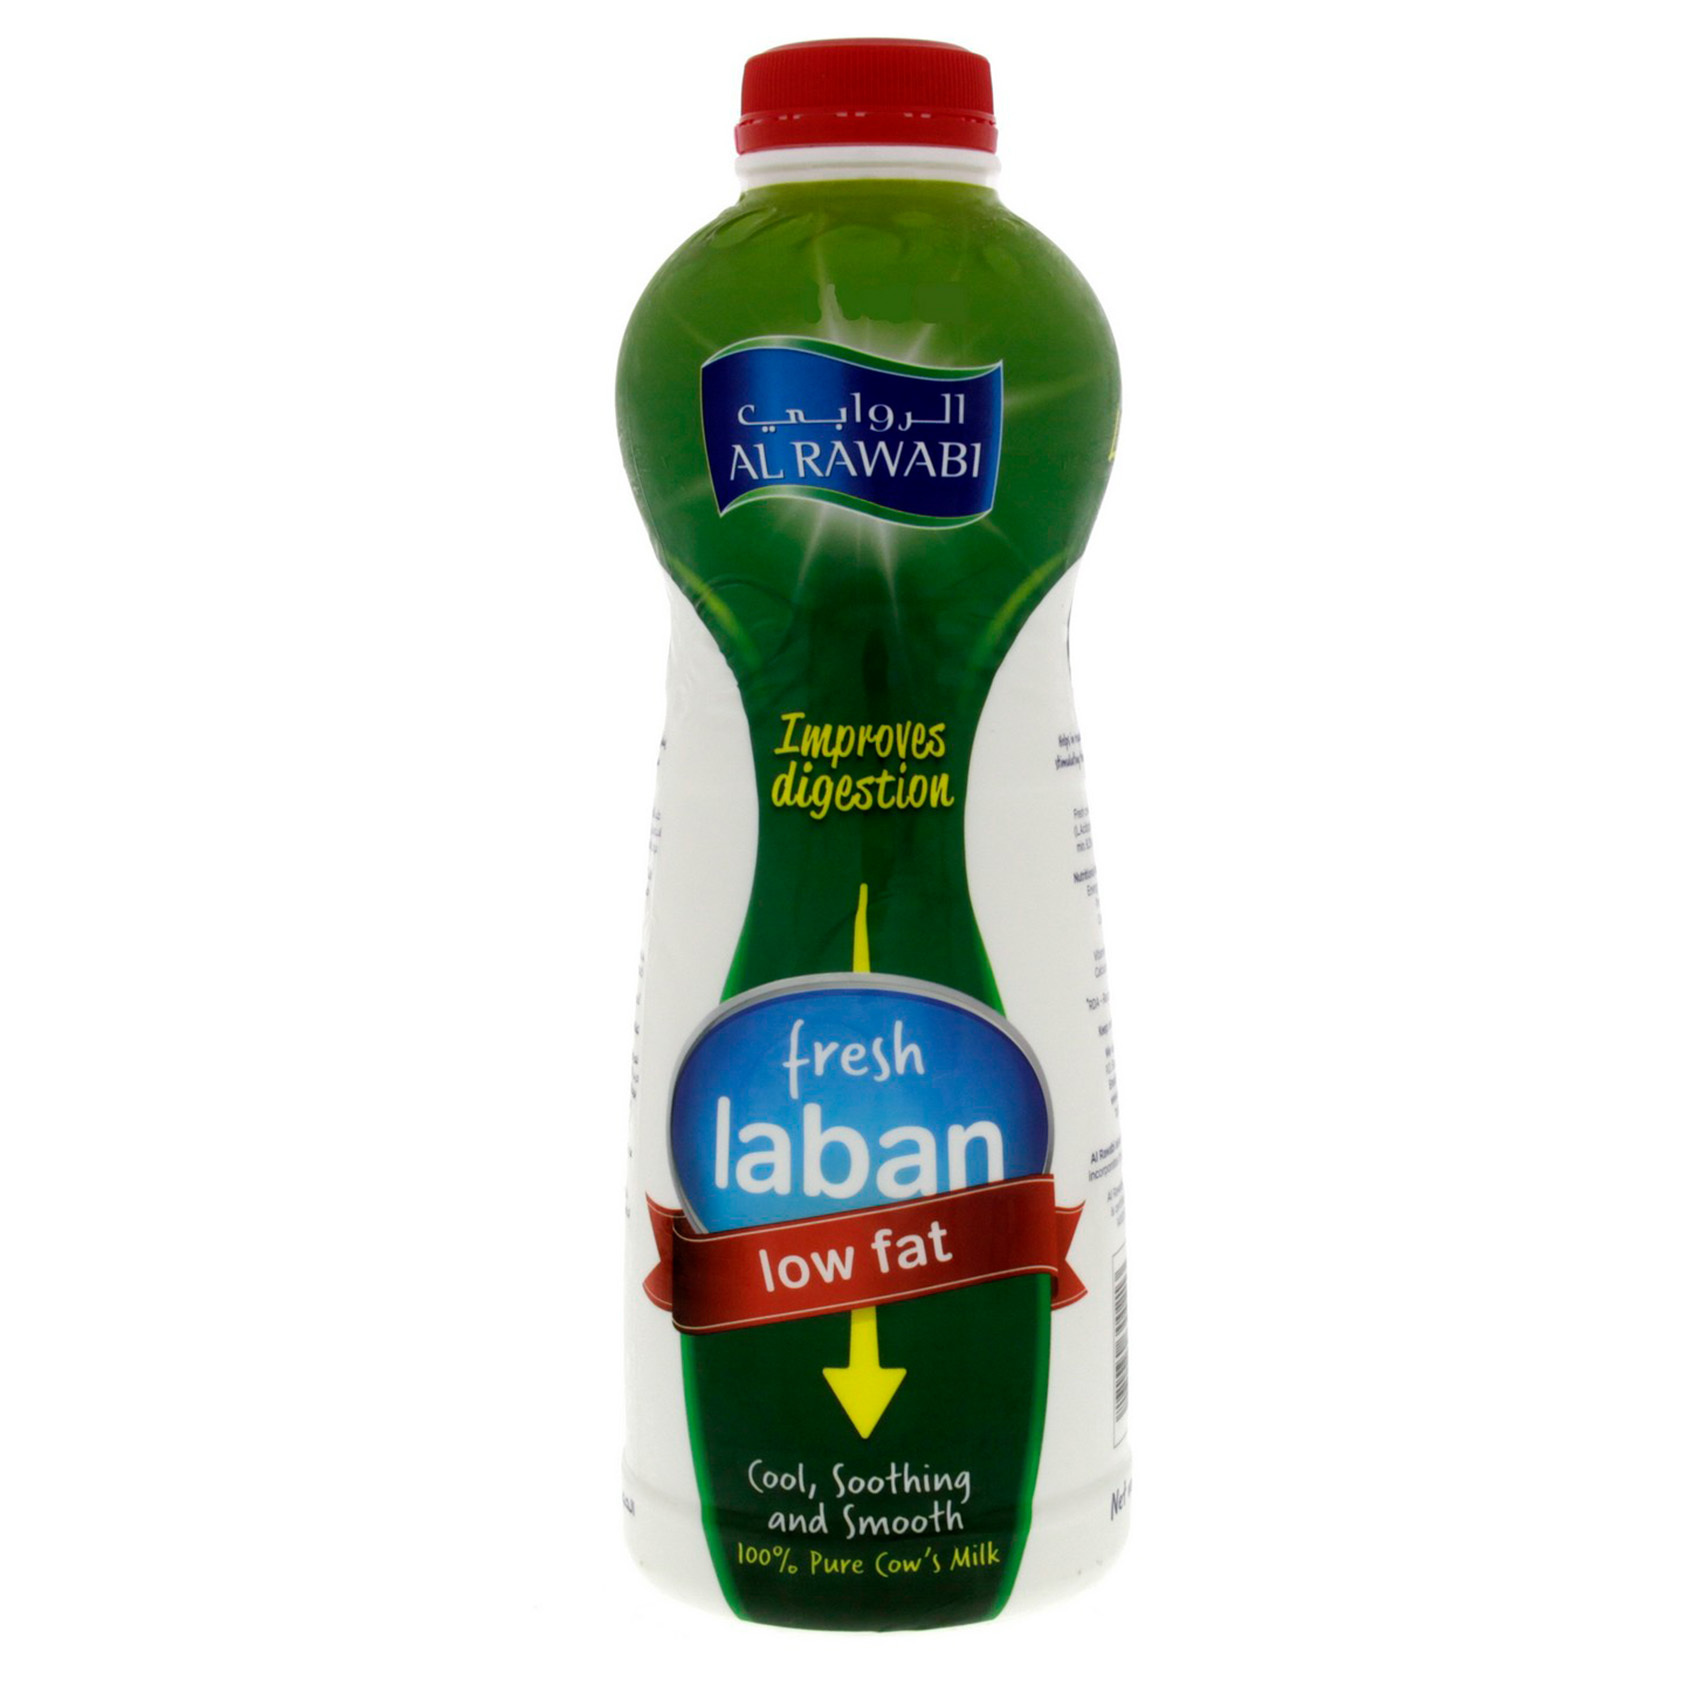 AL RAWABI ROBIVIA LABAN LOW FAT 1L